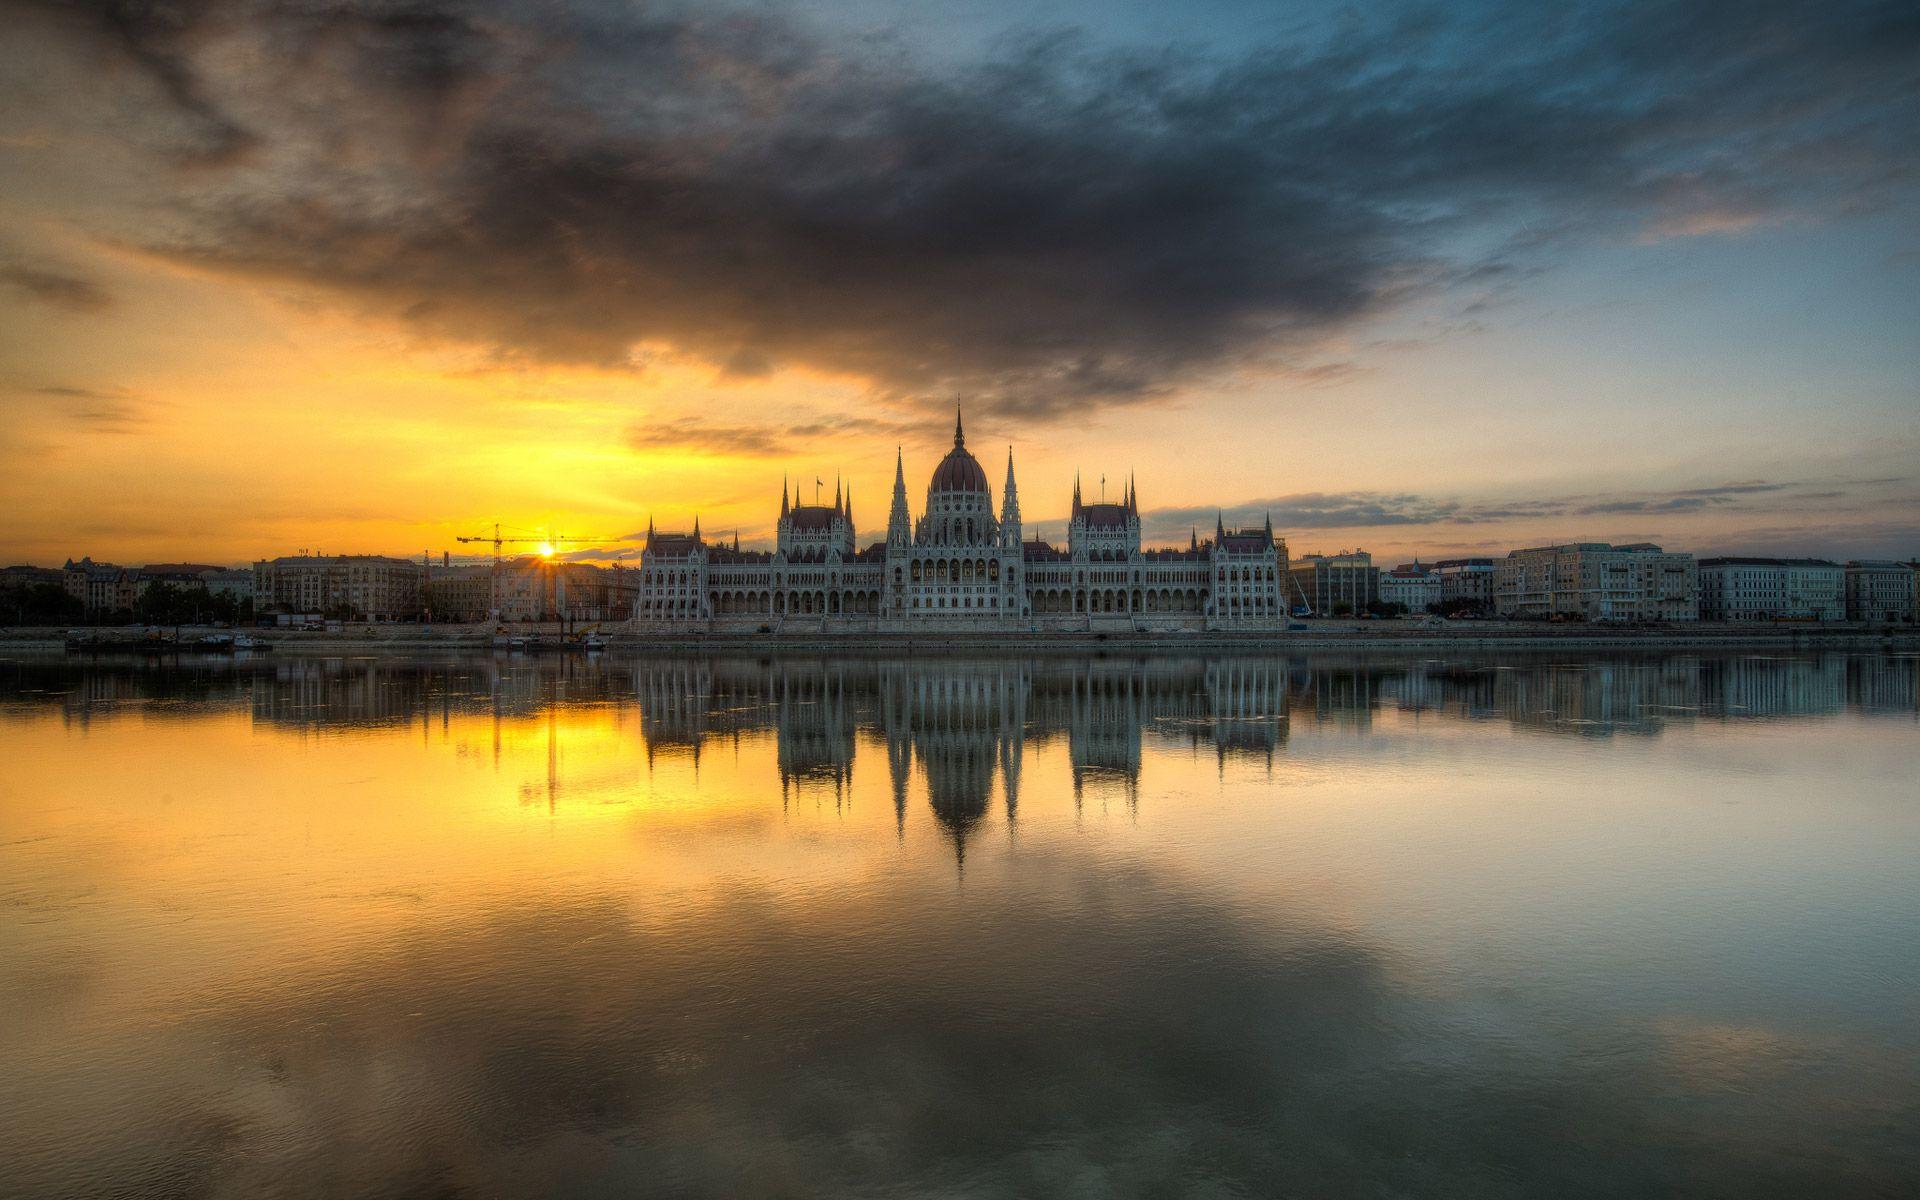 budapest city sunrise | pinterest | budapest city, budapest and city